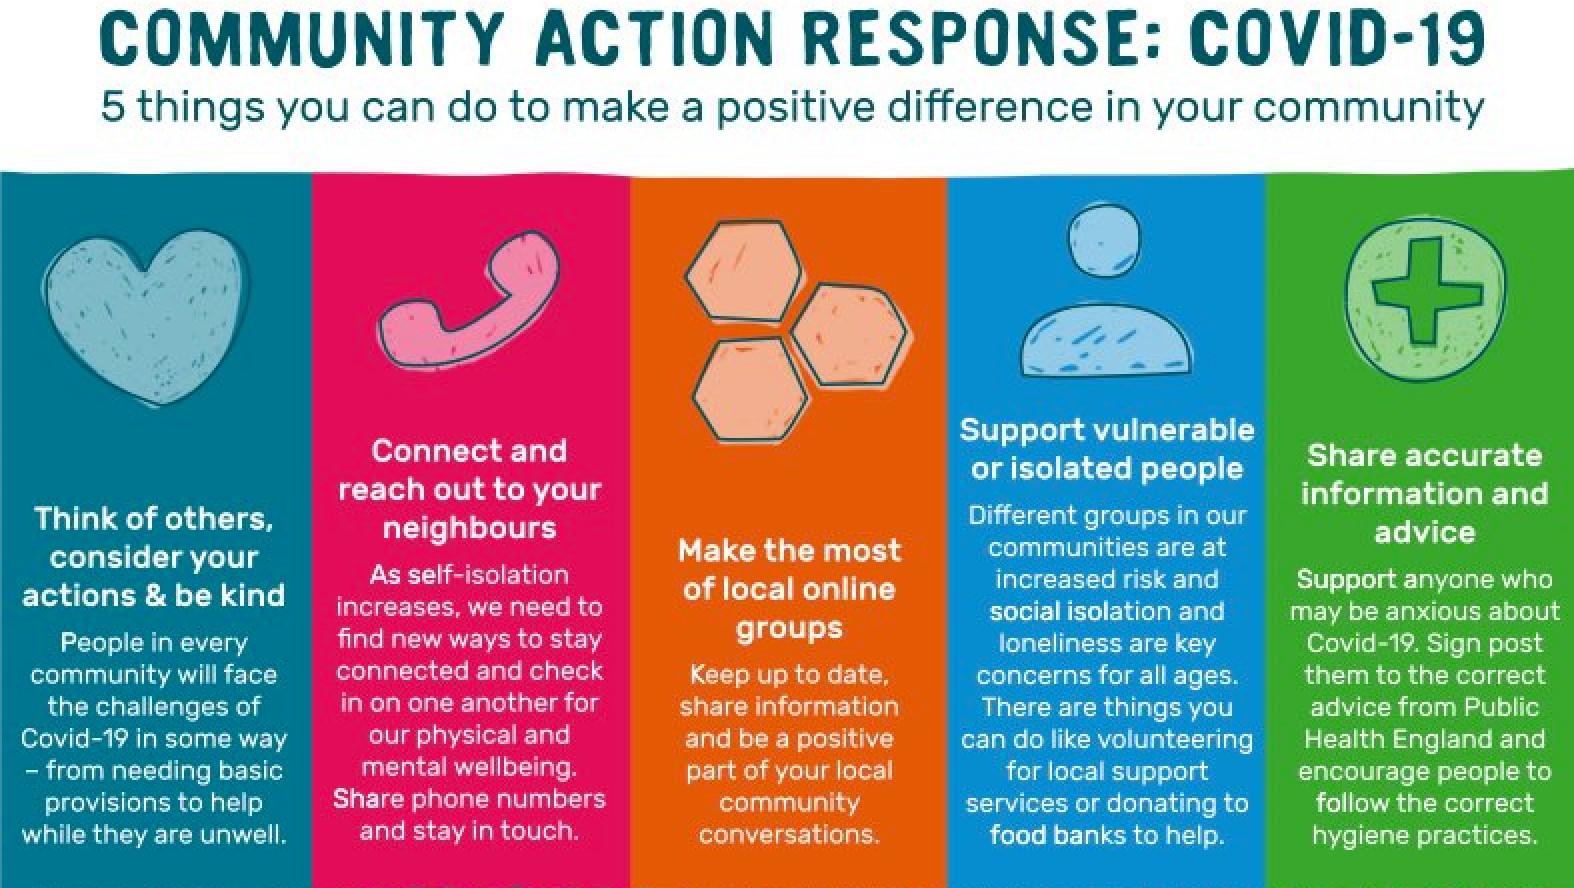 Community Action Response: COVID-19